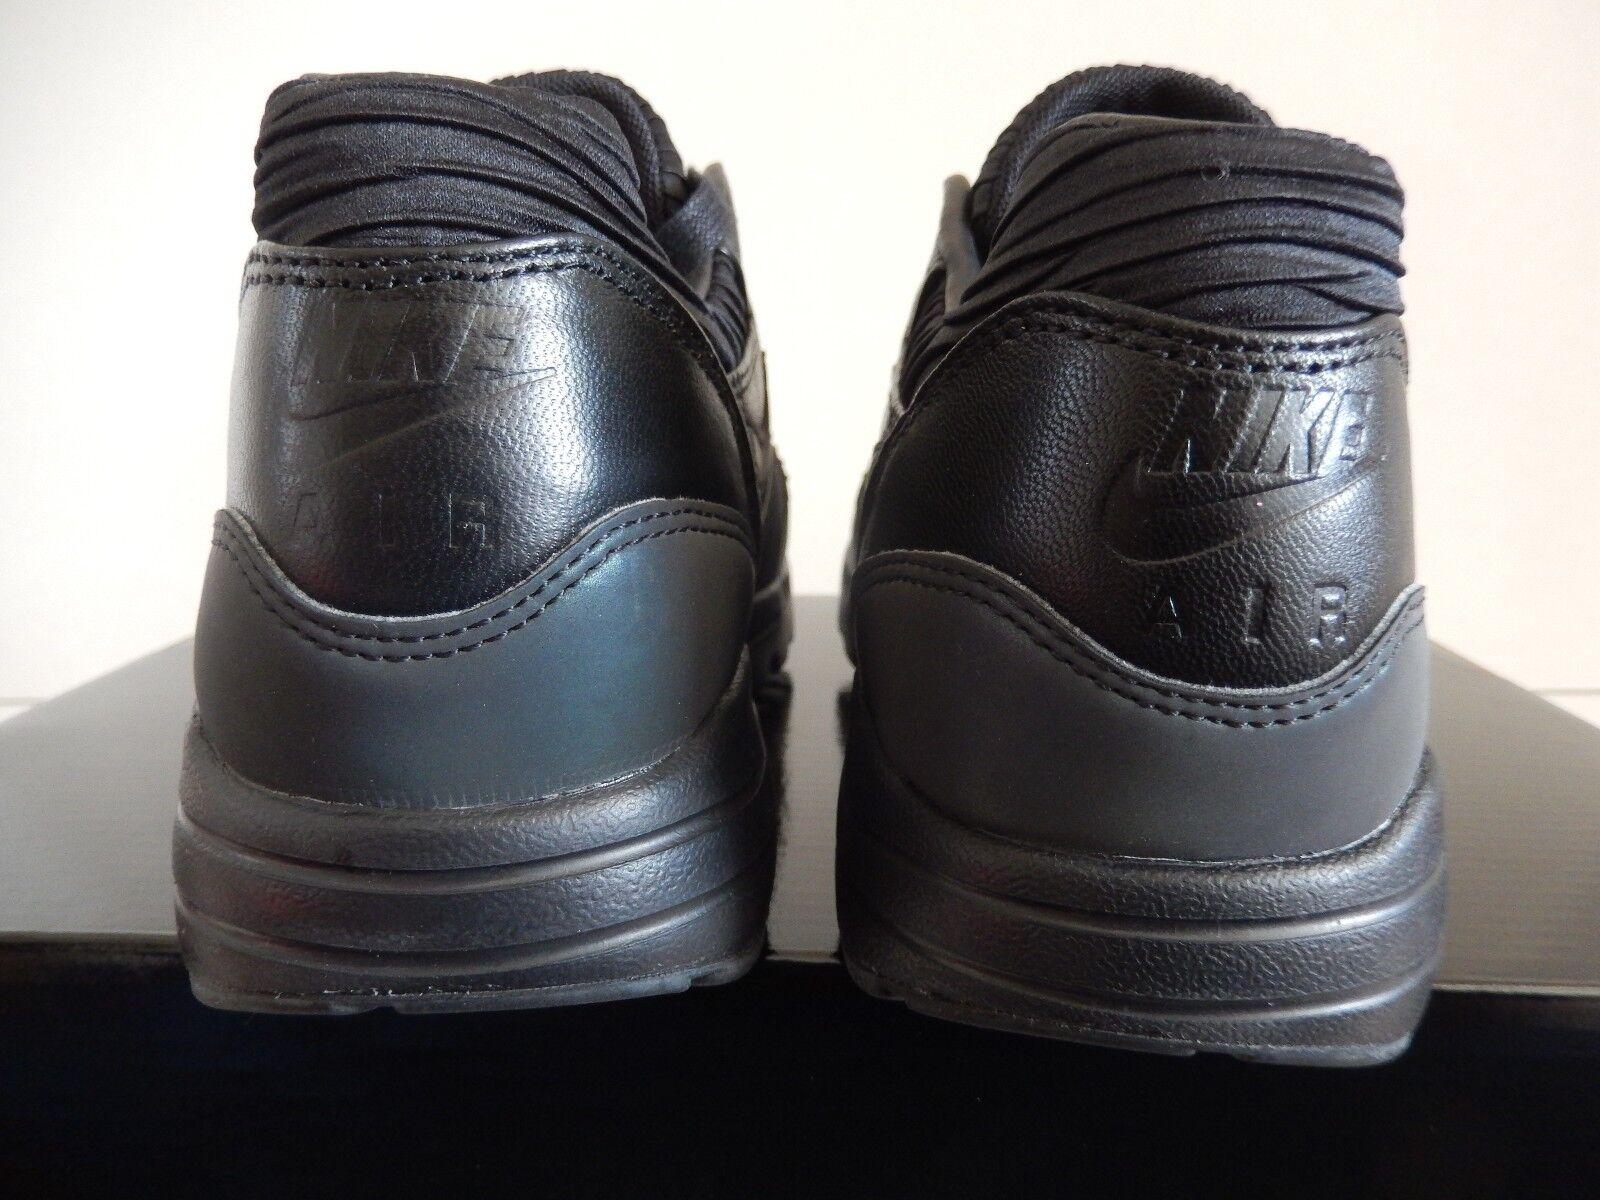 Mujeres Nike Nike Nike Air Max 1 Ultra Star Wars QS  Serena Williams  Talla 6 e6e4af